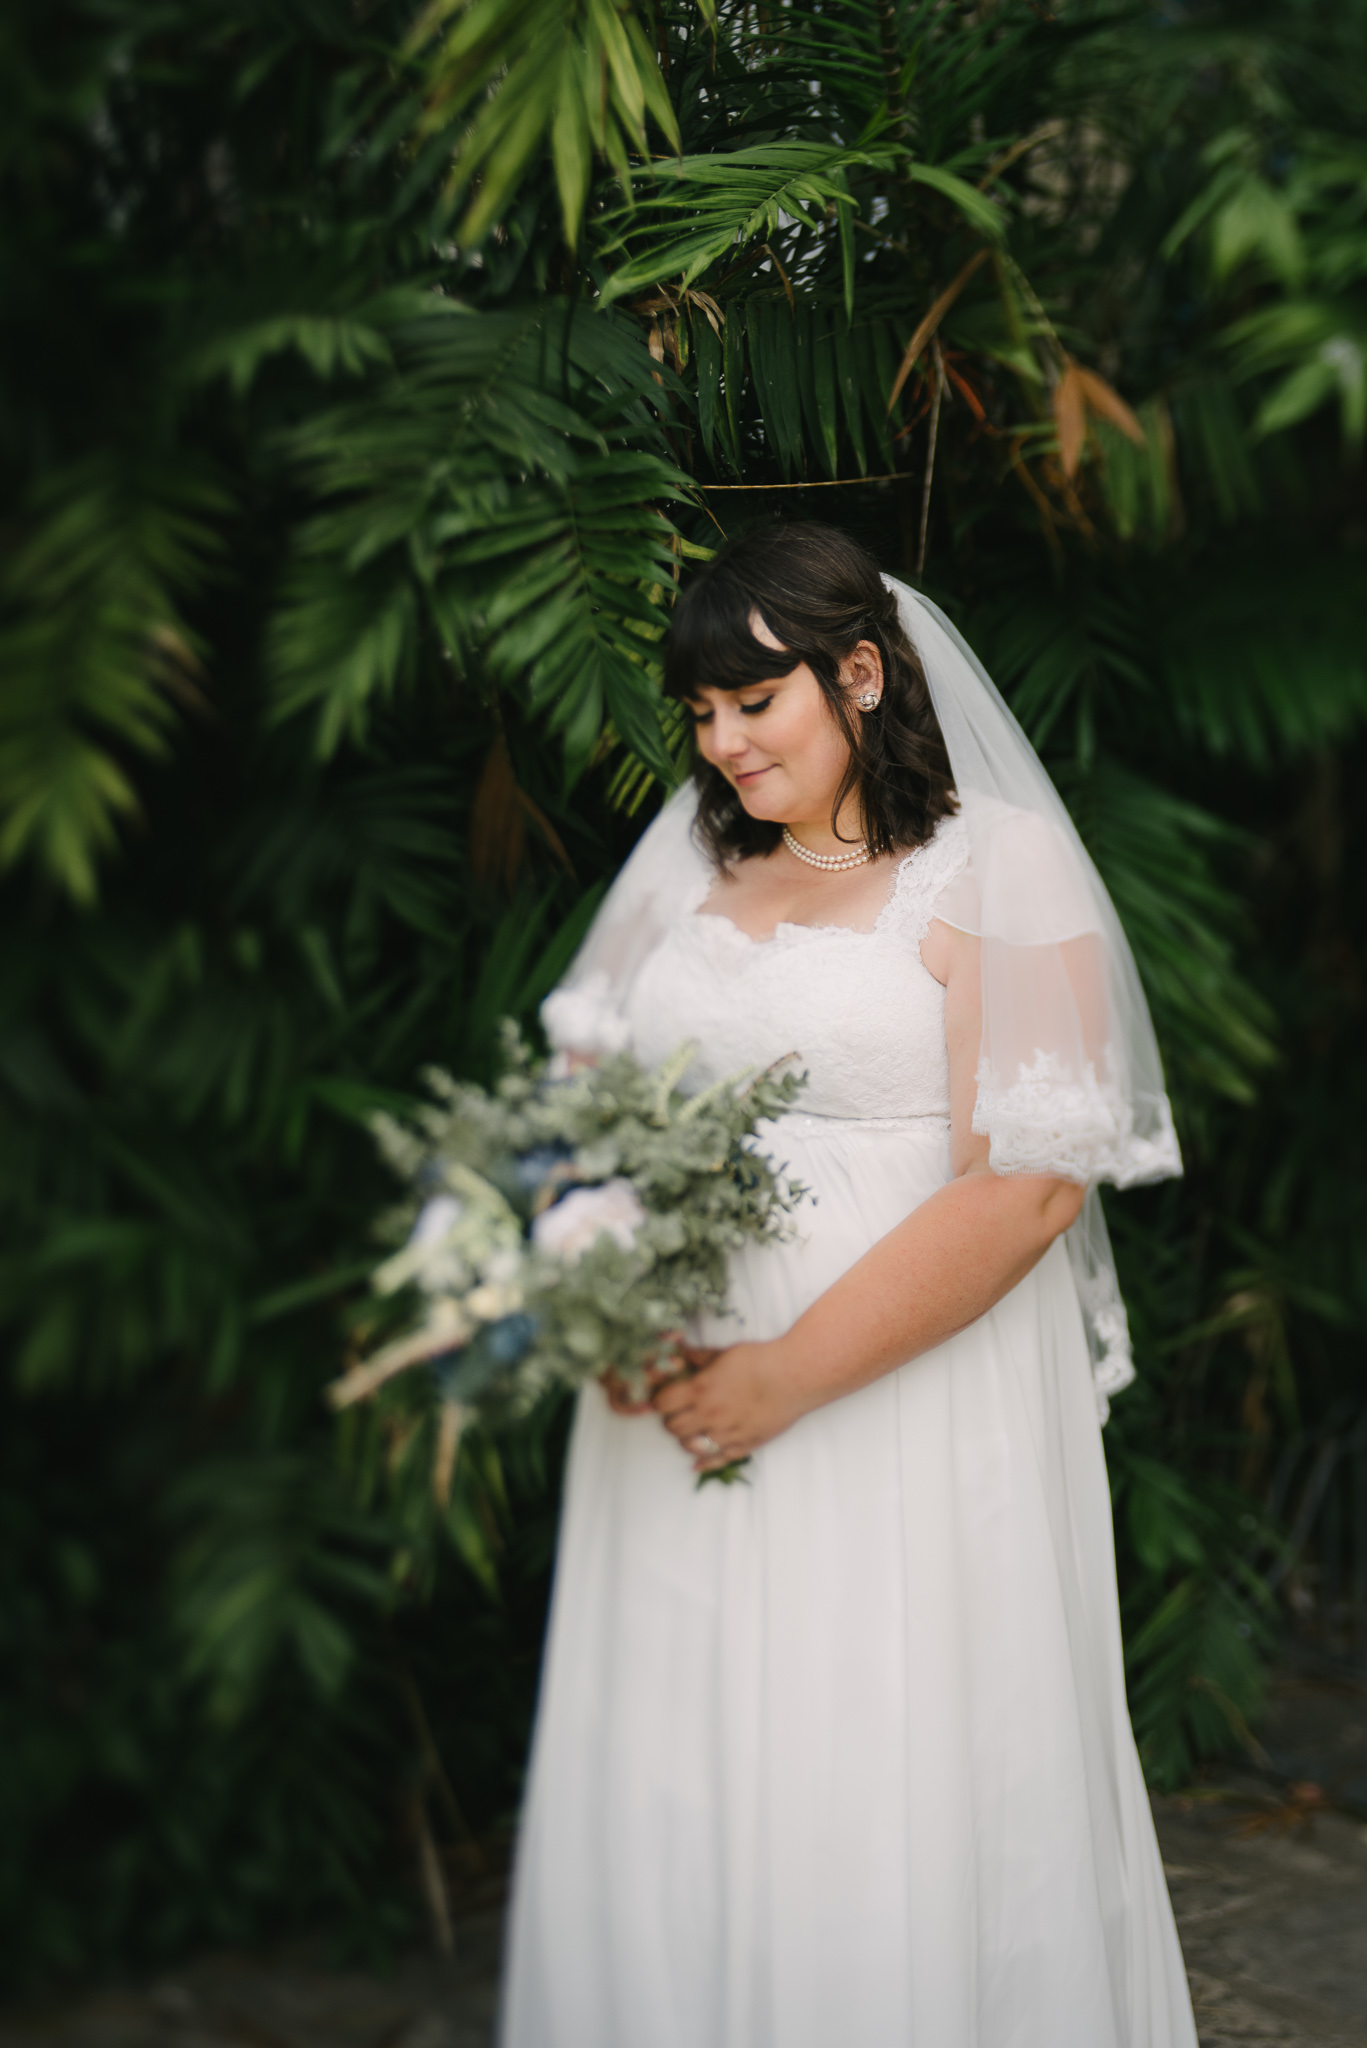 santabarbaracourthousewedding-27.jpg